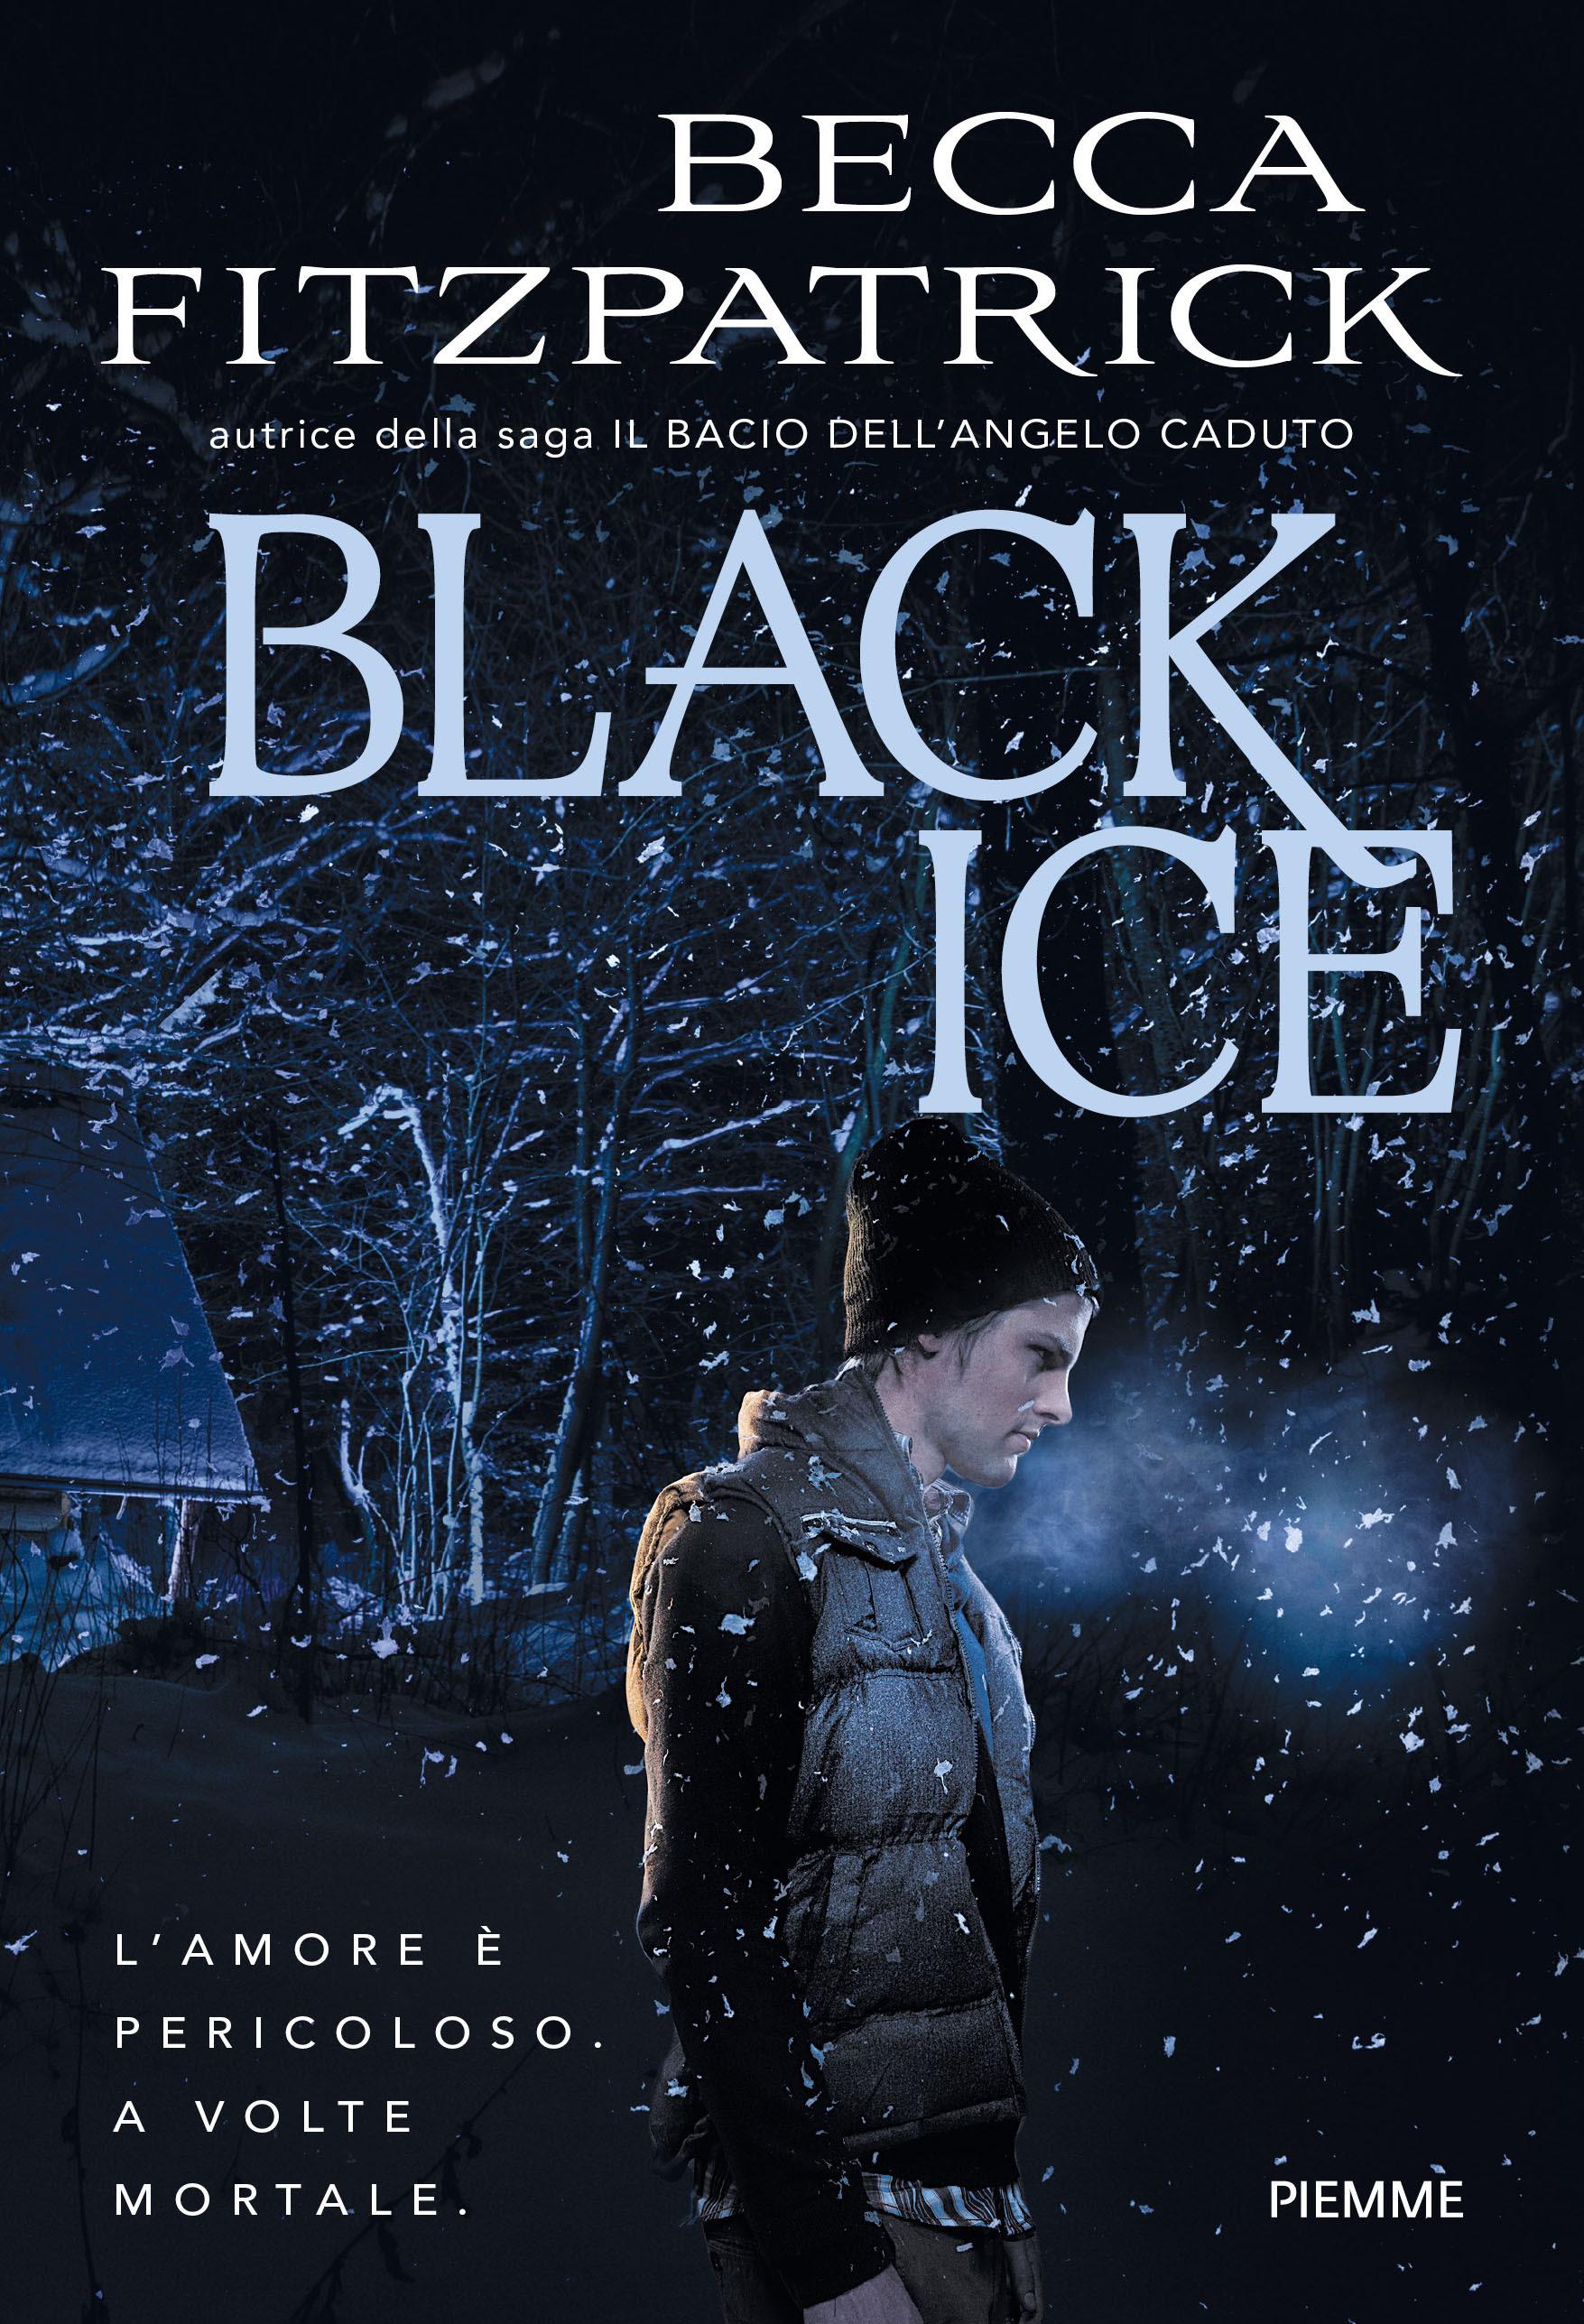 http://booksinthestarrynight.blogspot.it/2014/11/recensione-black-ice-di-becca.html